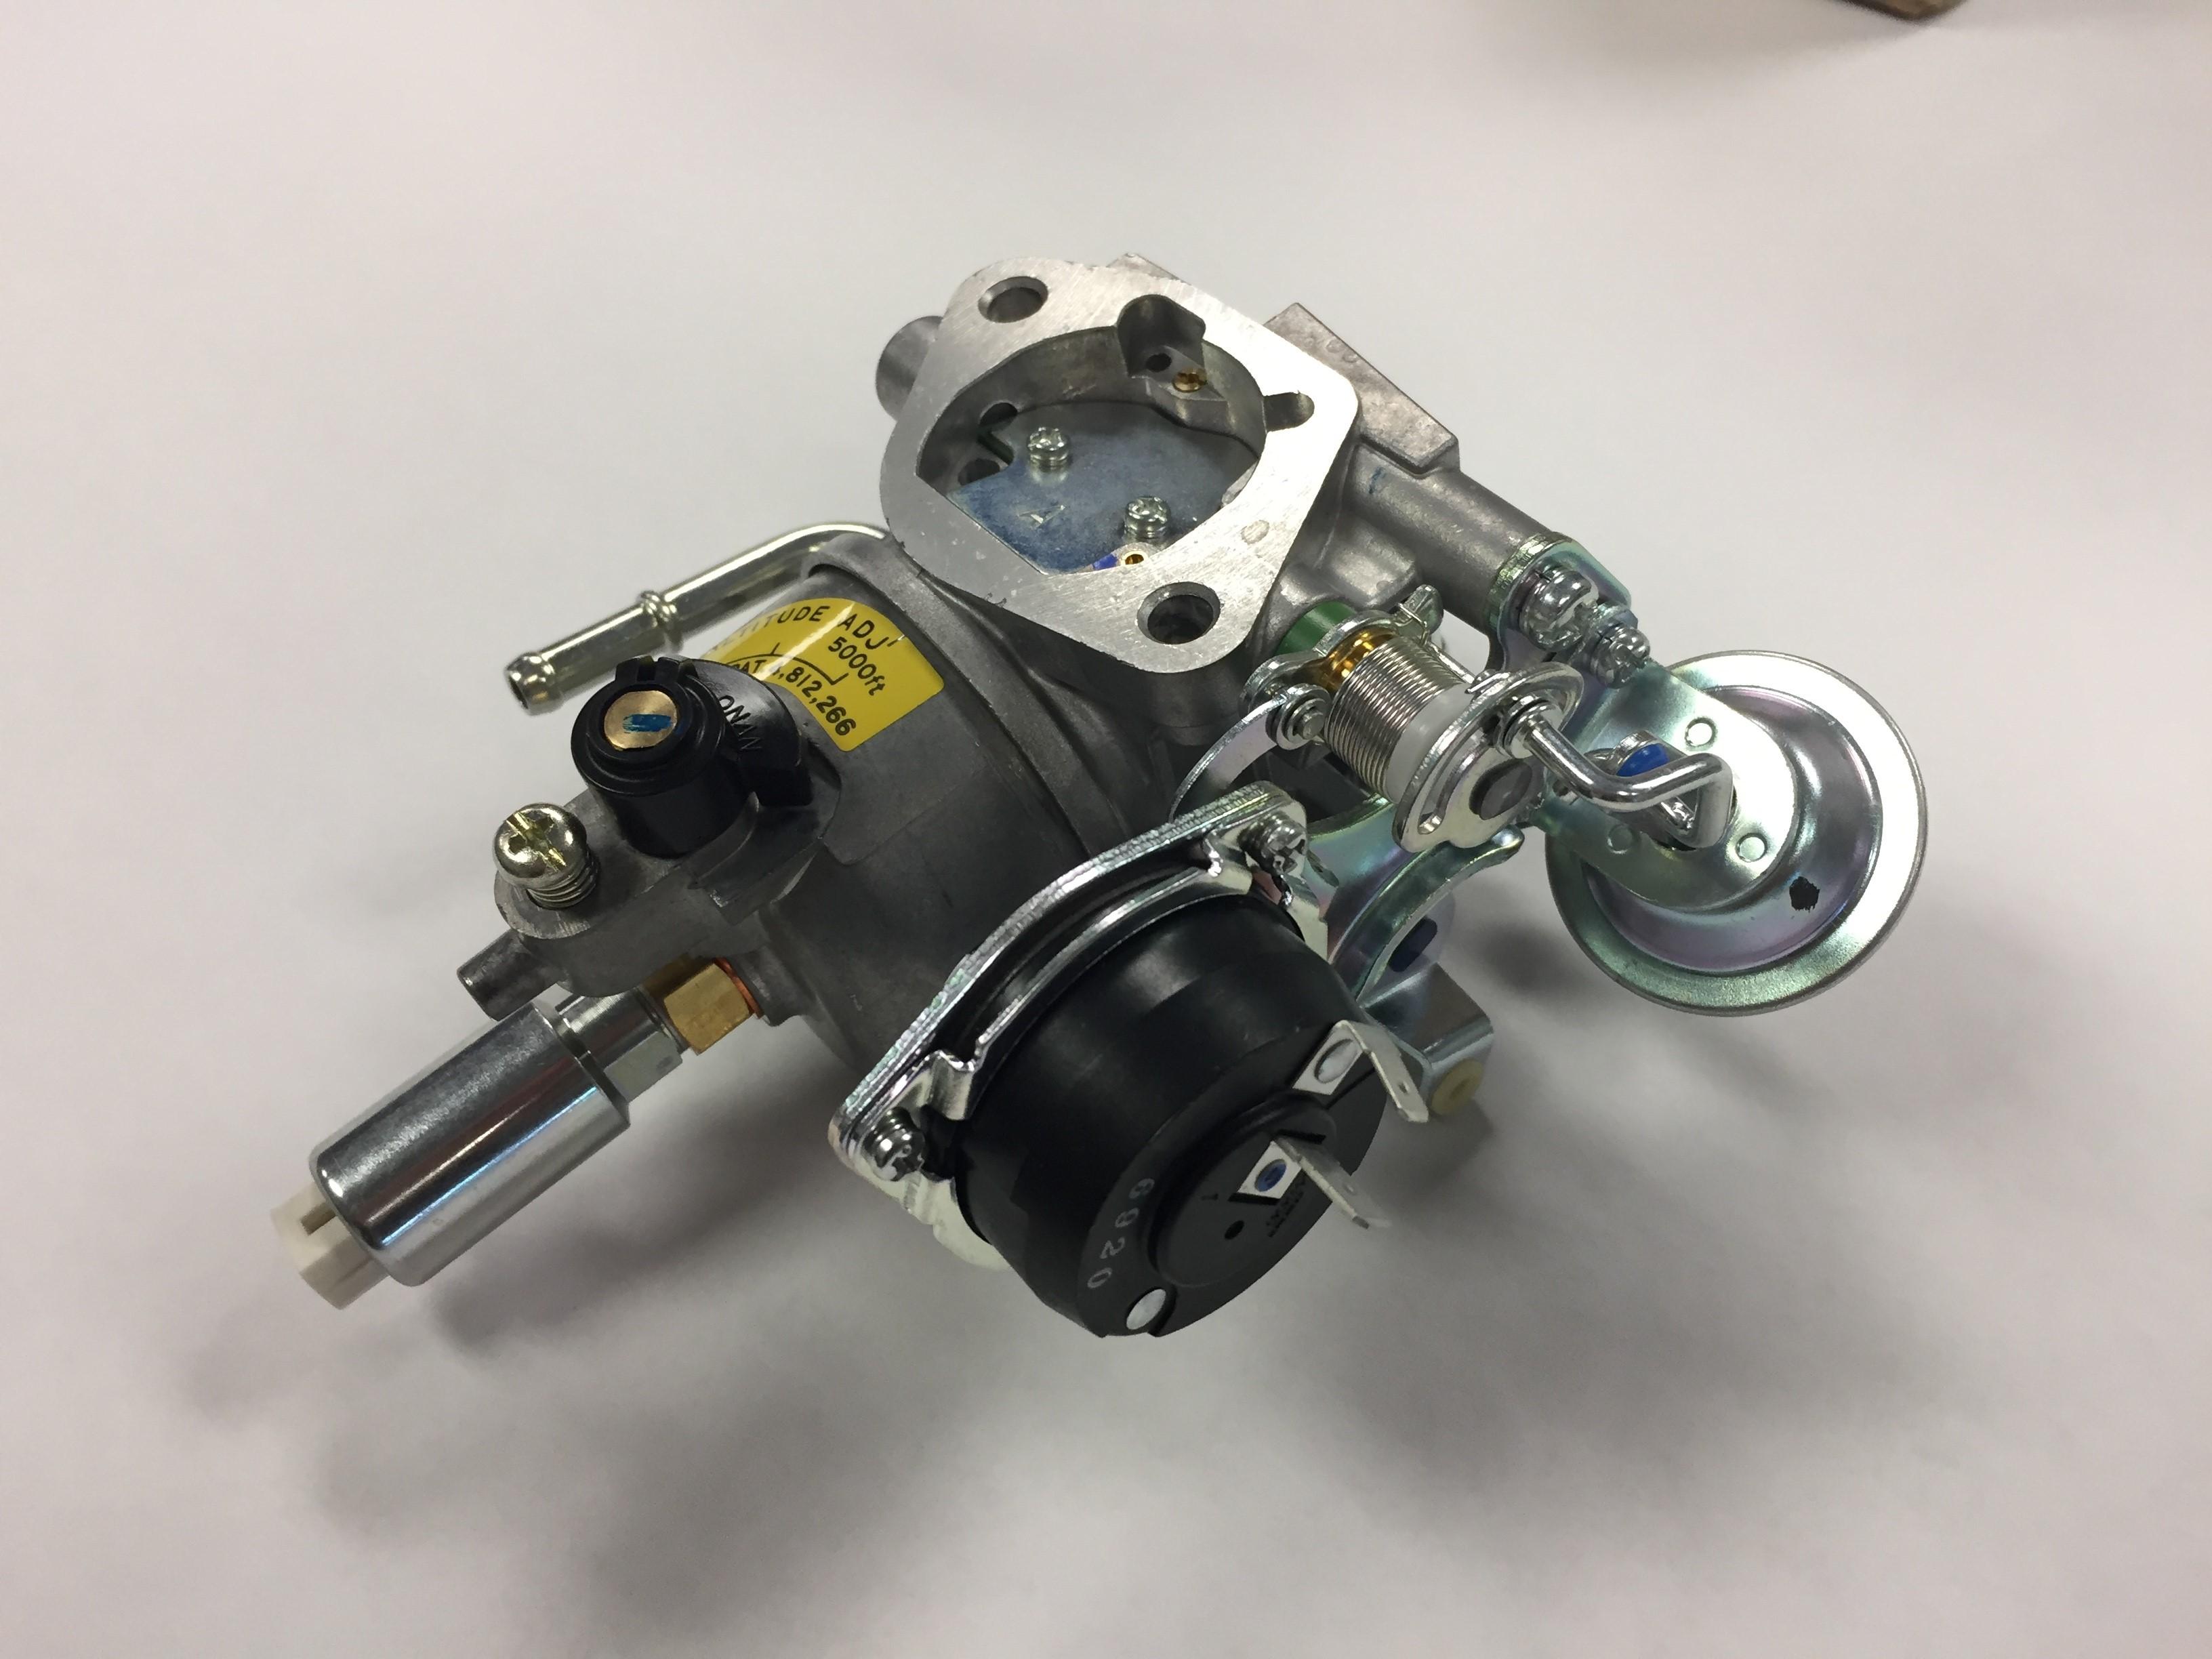 hight resolution of replacement parts for installed generators ppl motor homes rh pplmotorhomes com onan generator remote switch wiring diagram onan generator 4000 schematic